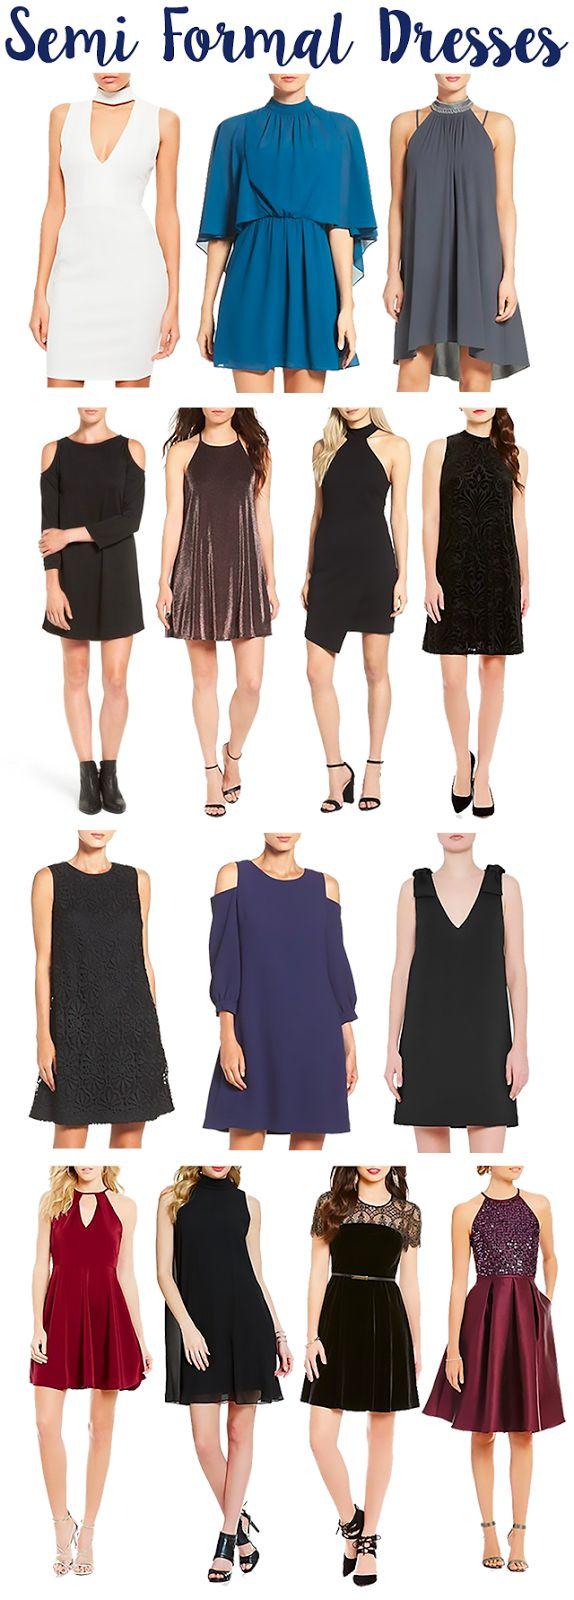 Sass del Sur: What to Wear: Sorority Semi-Formal/Formal